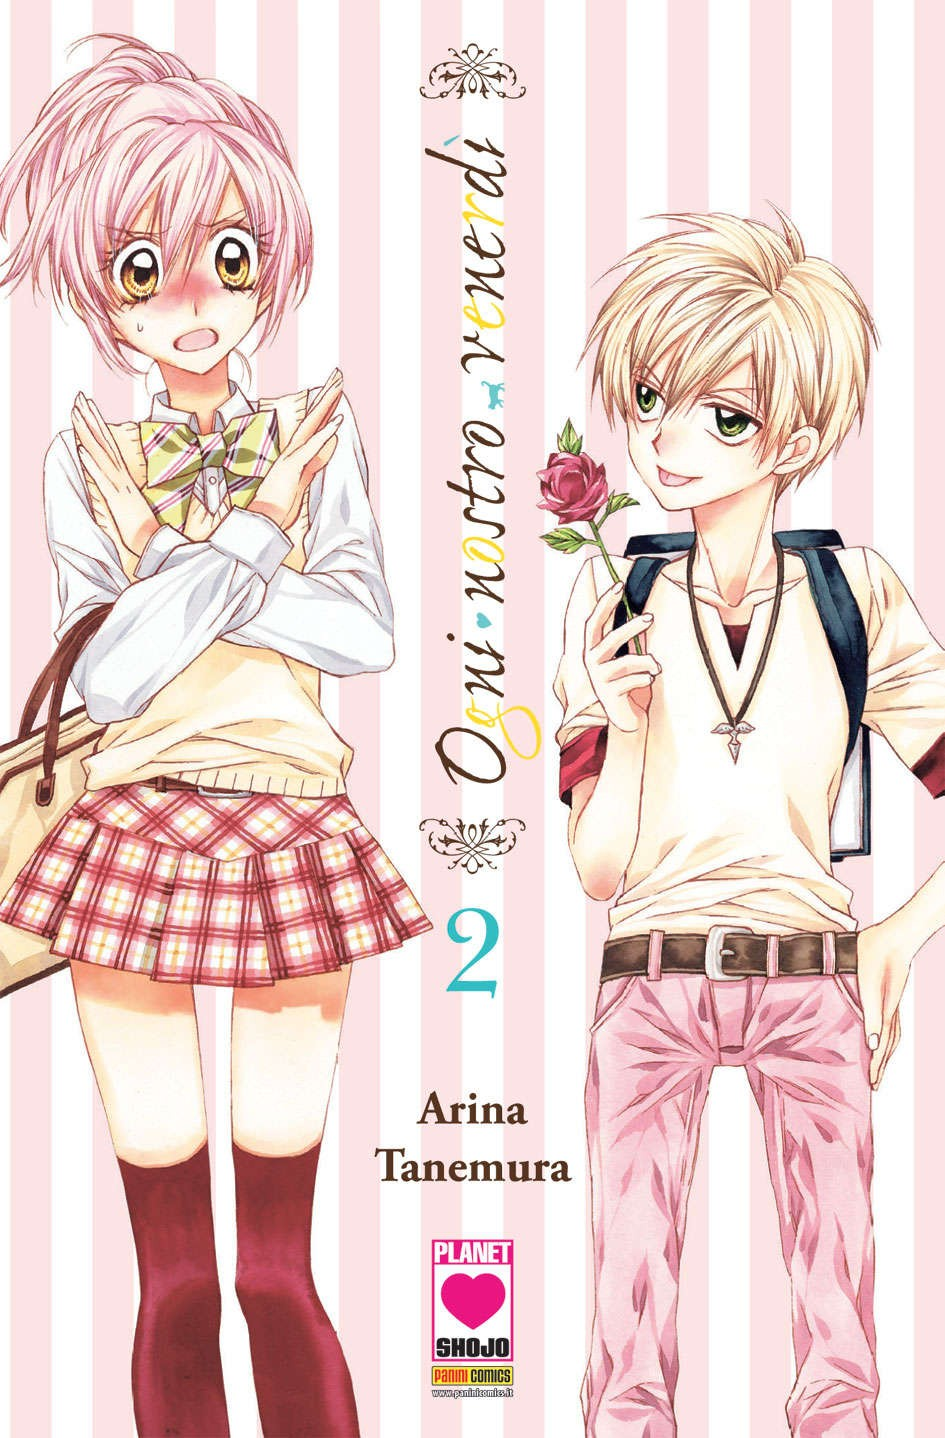 Ogni Nostro Venerdi' (M11) - N° 2 - Ogni Nostro Venerdi' - Manga Moon Planet Manga